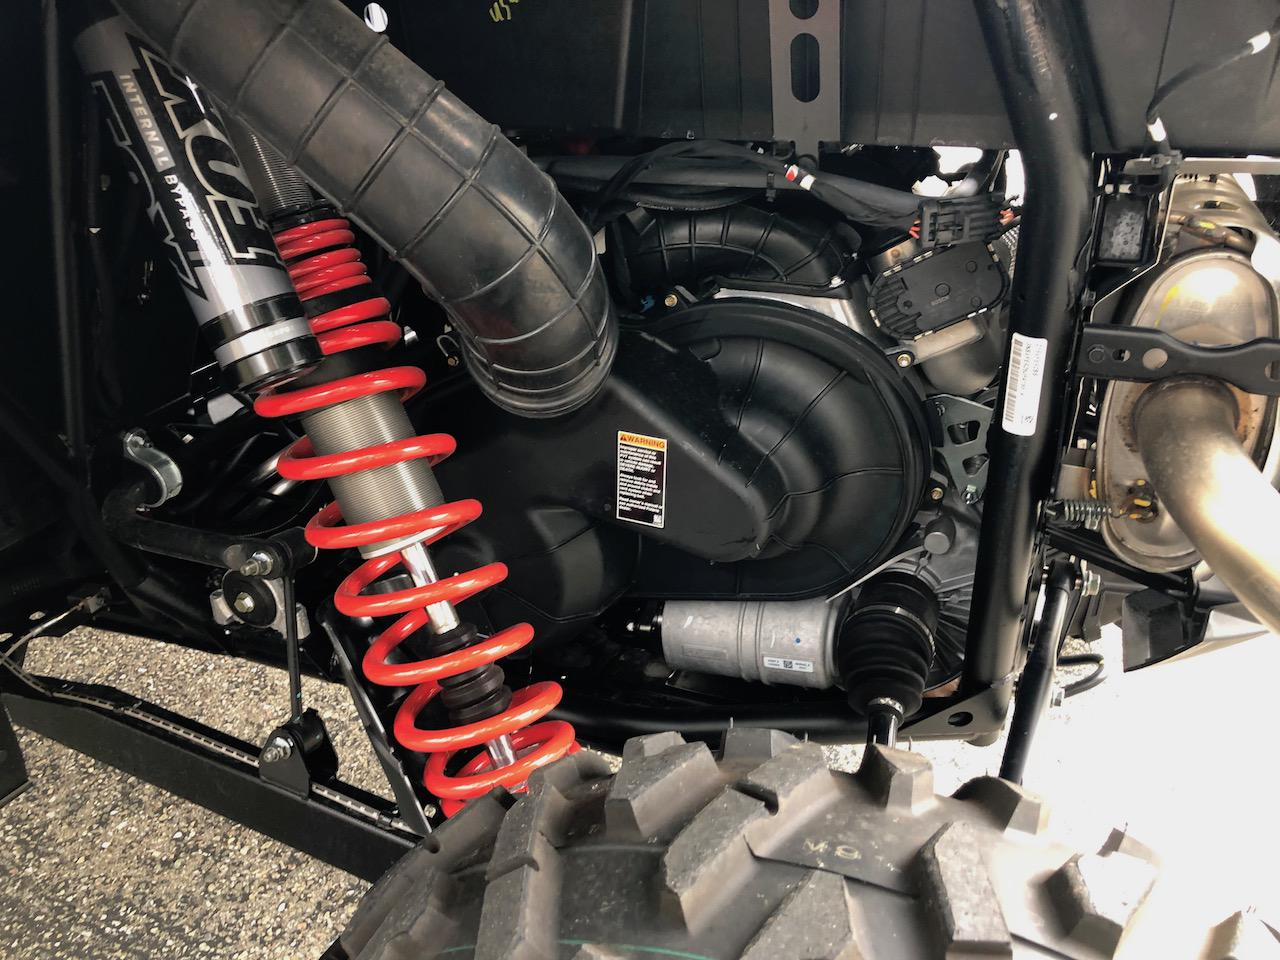 2018 Polaris Industries RZR XP® 4 Turbo EPS FOX Edition - Matte Sunset Red